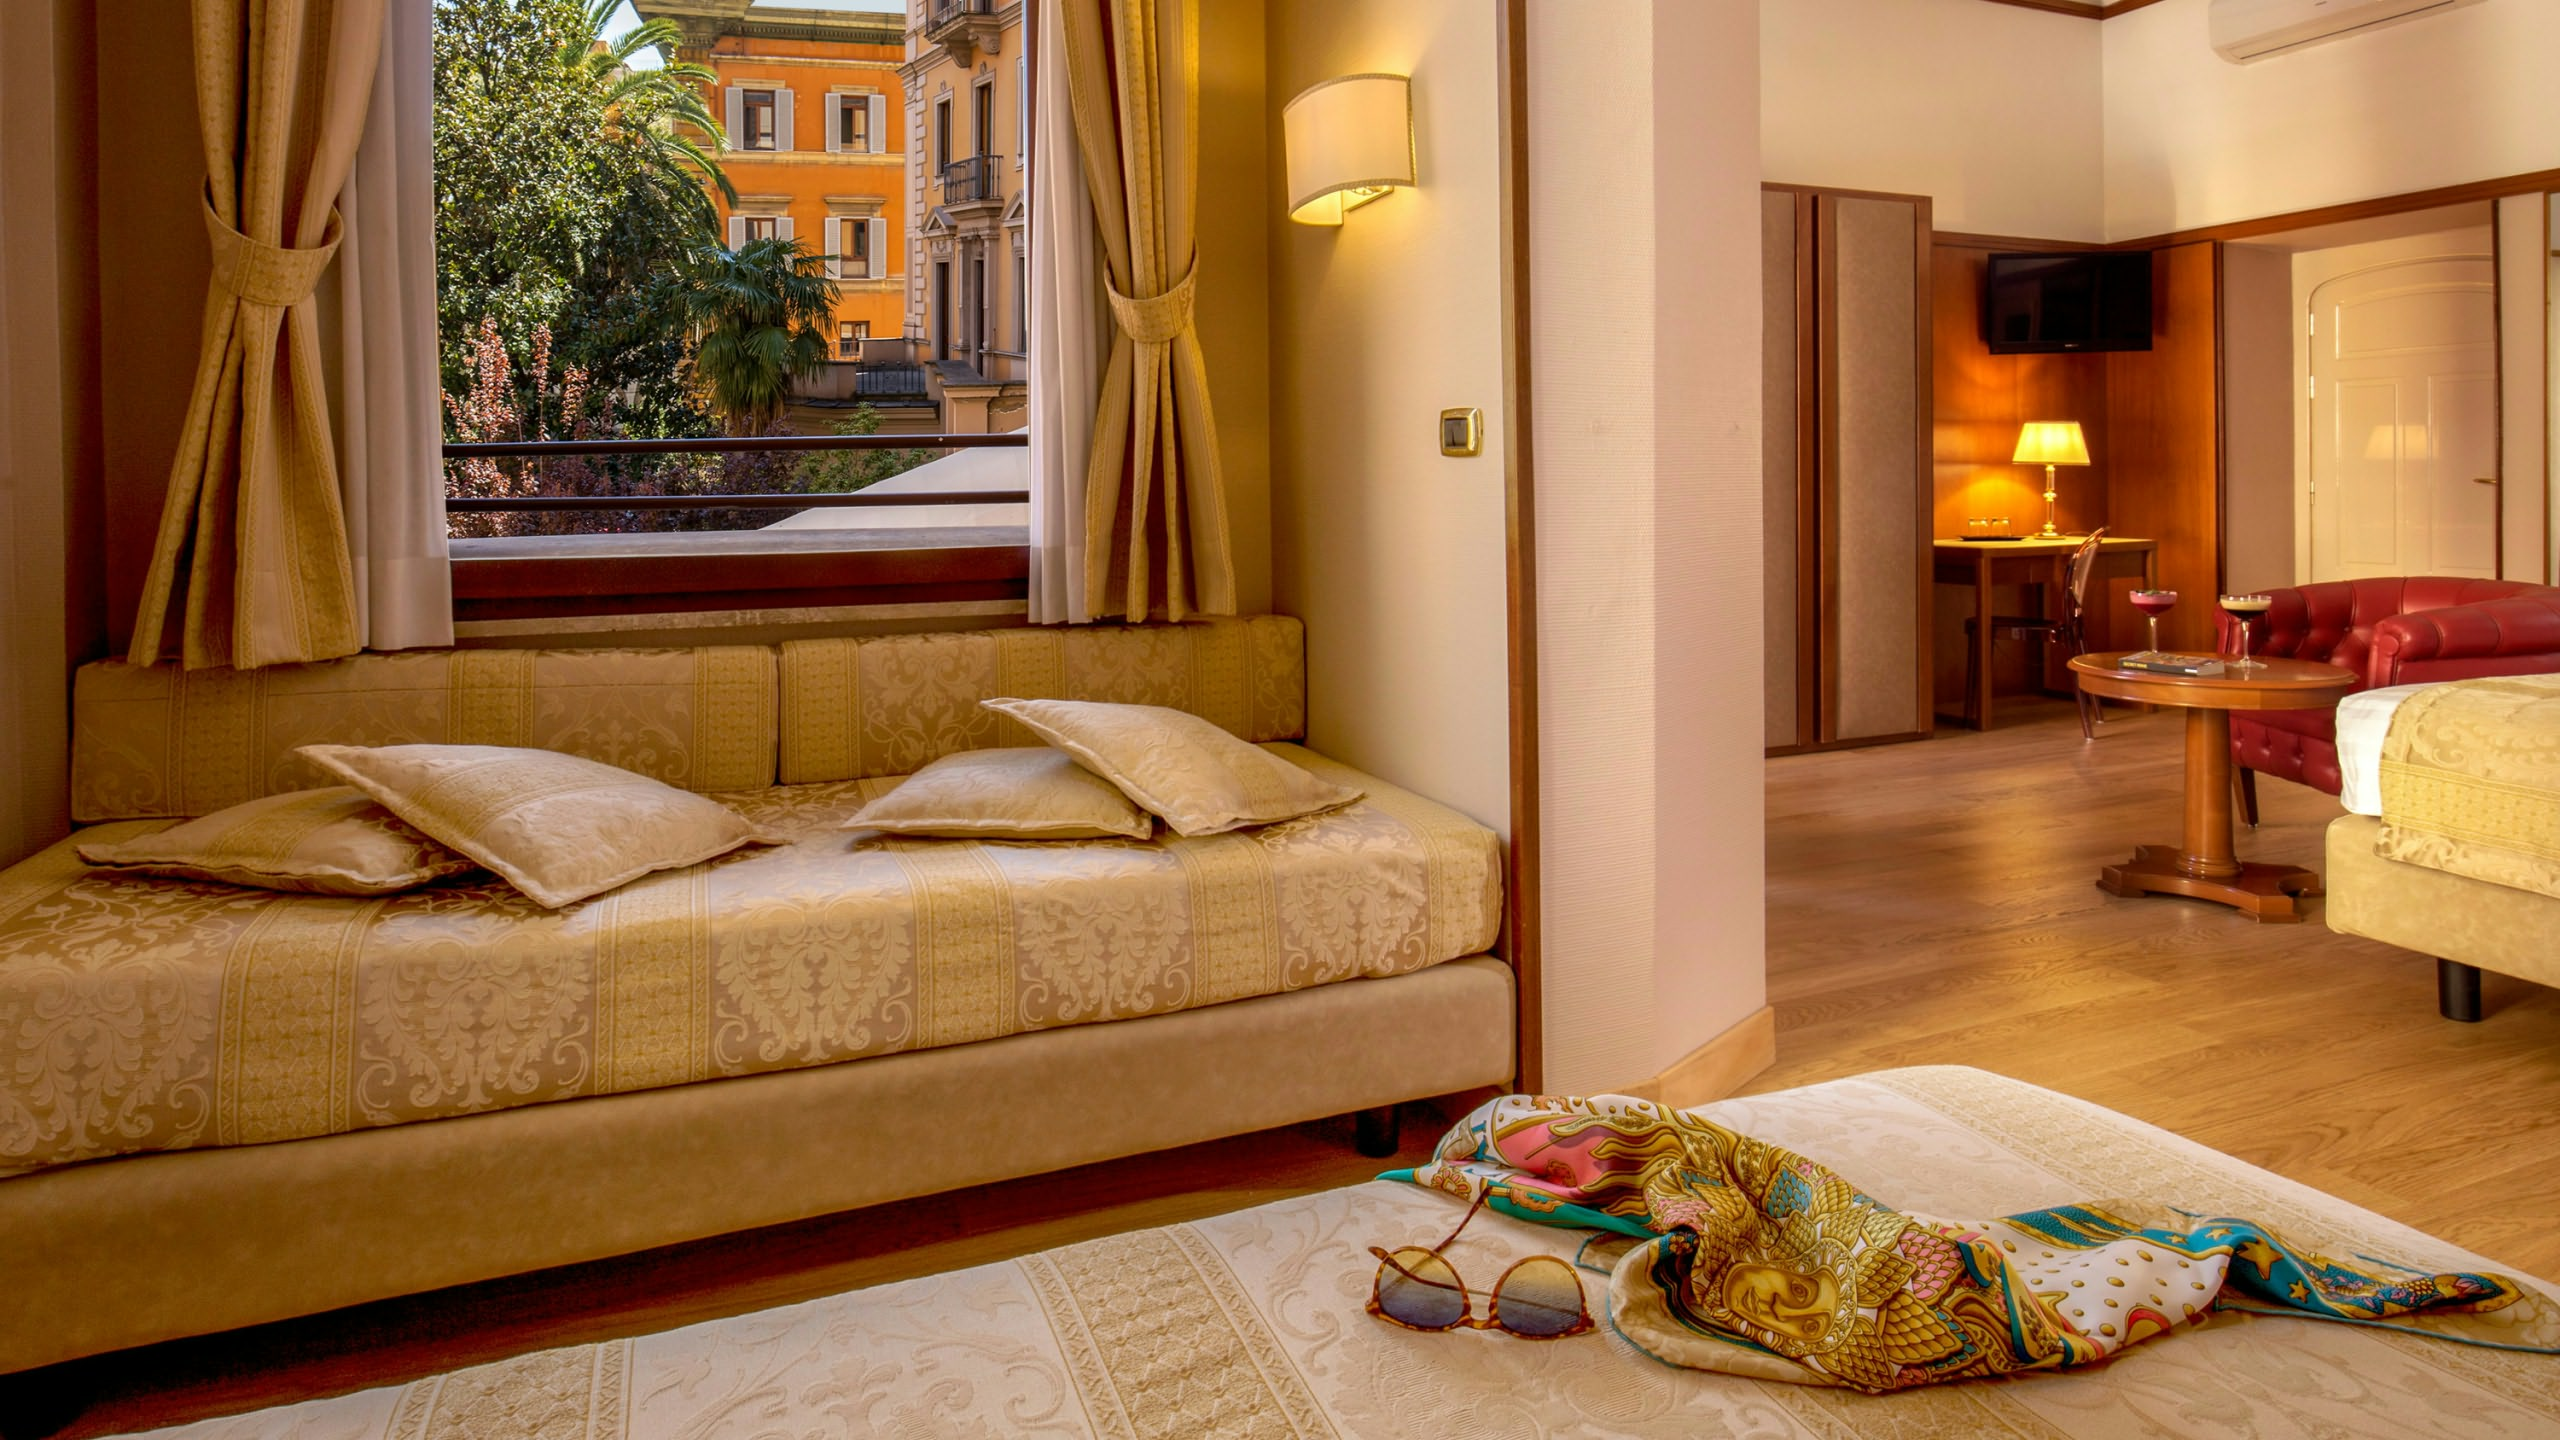 hotel-la-residenza-roma-camere-2562n